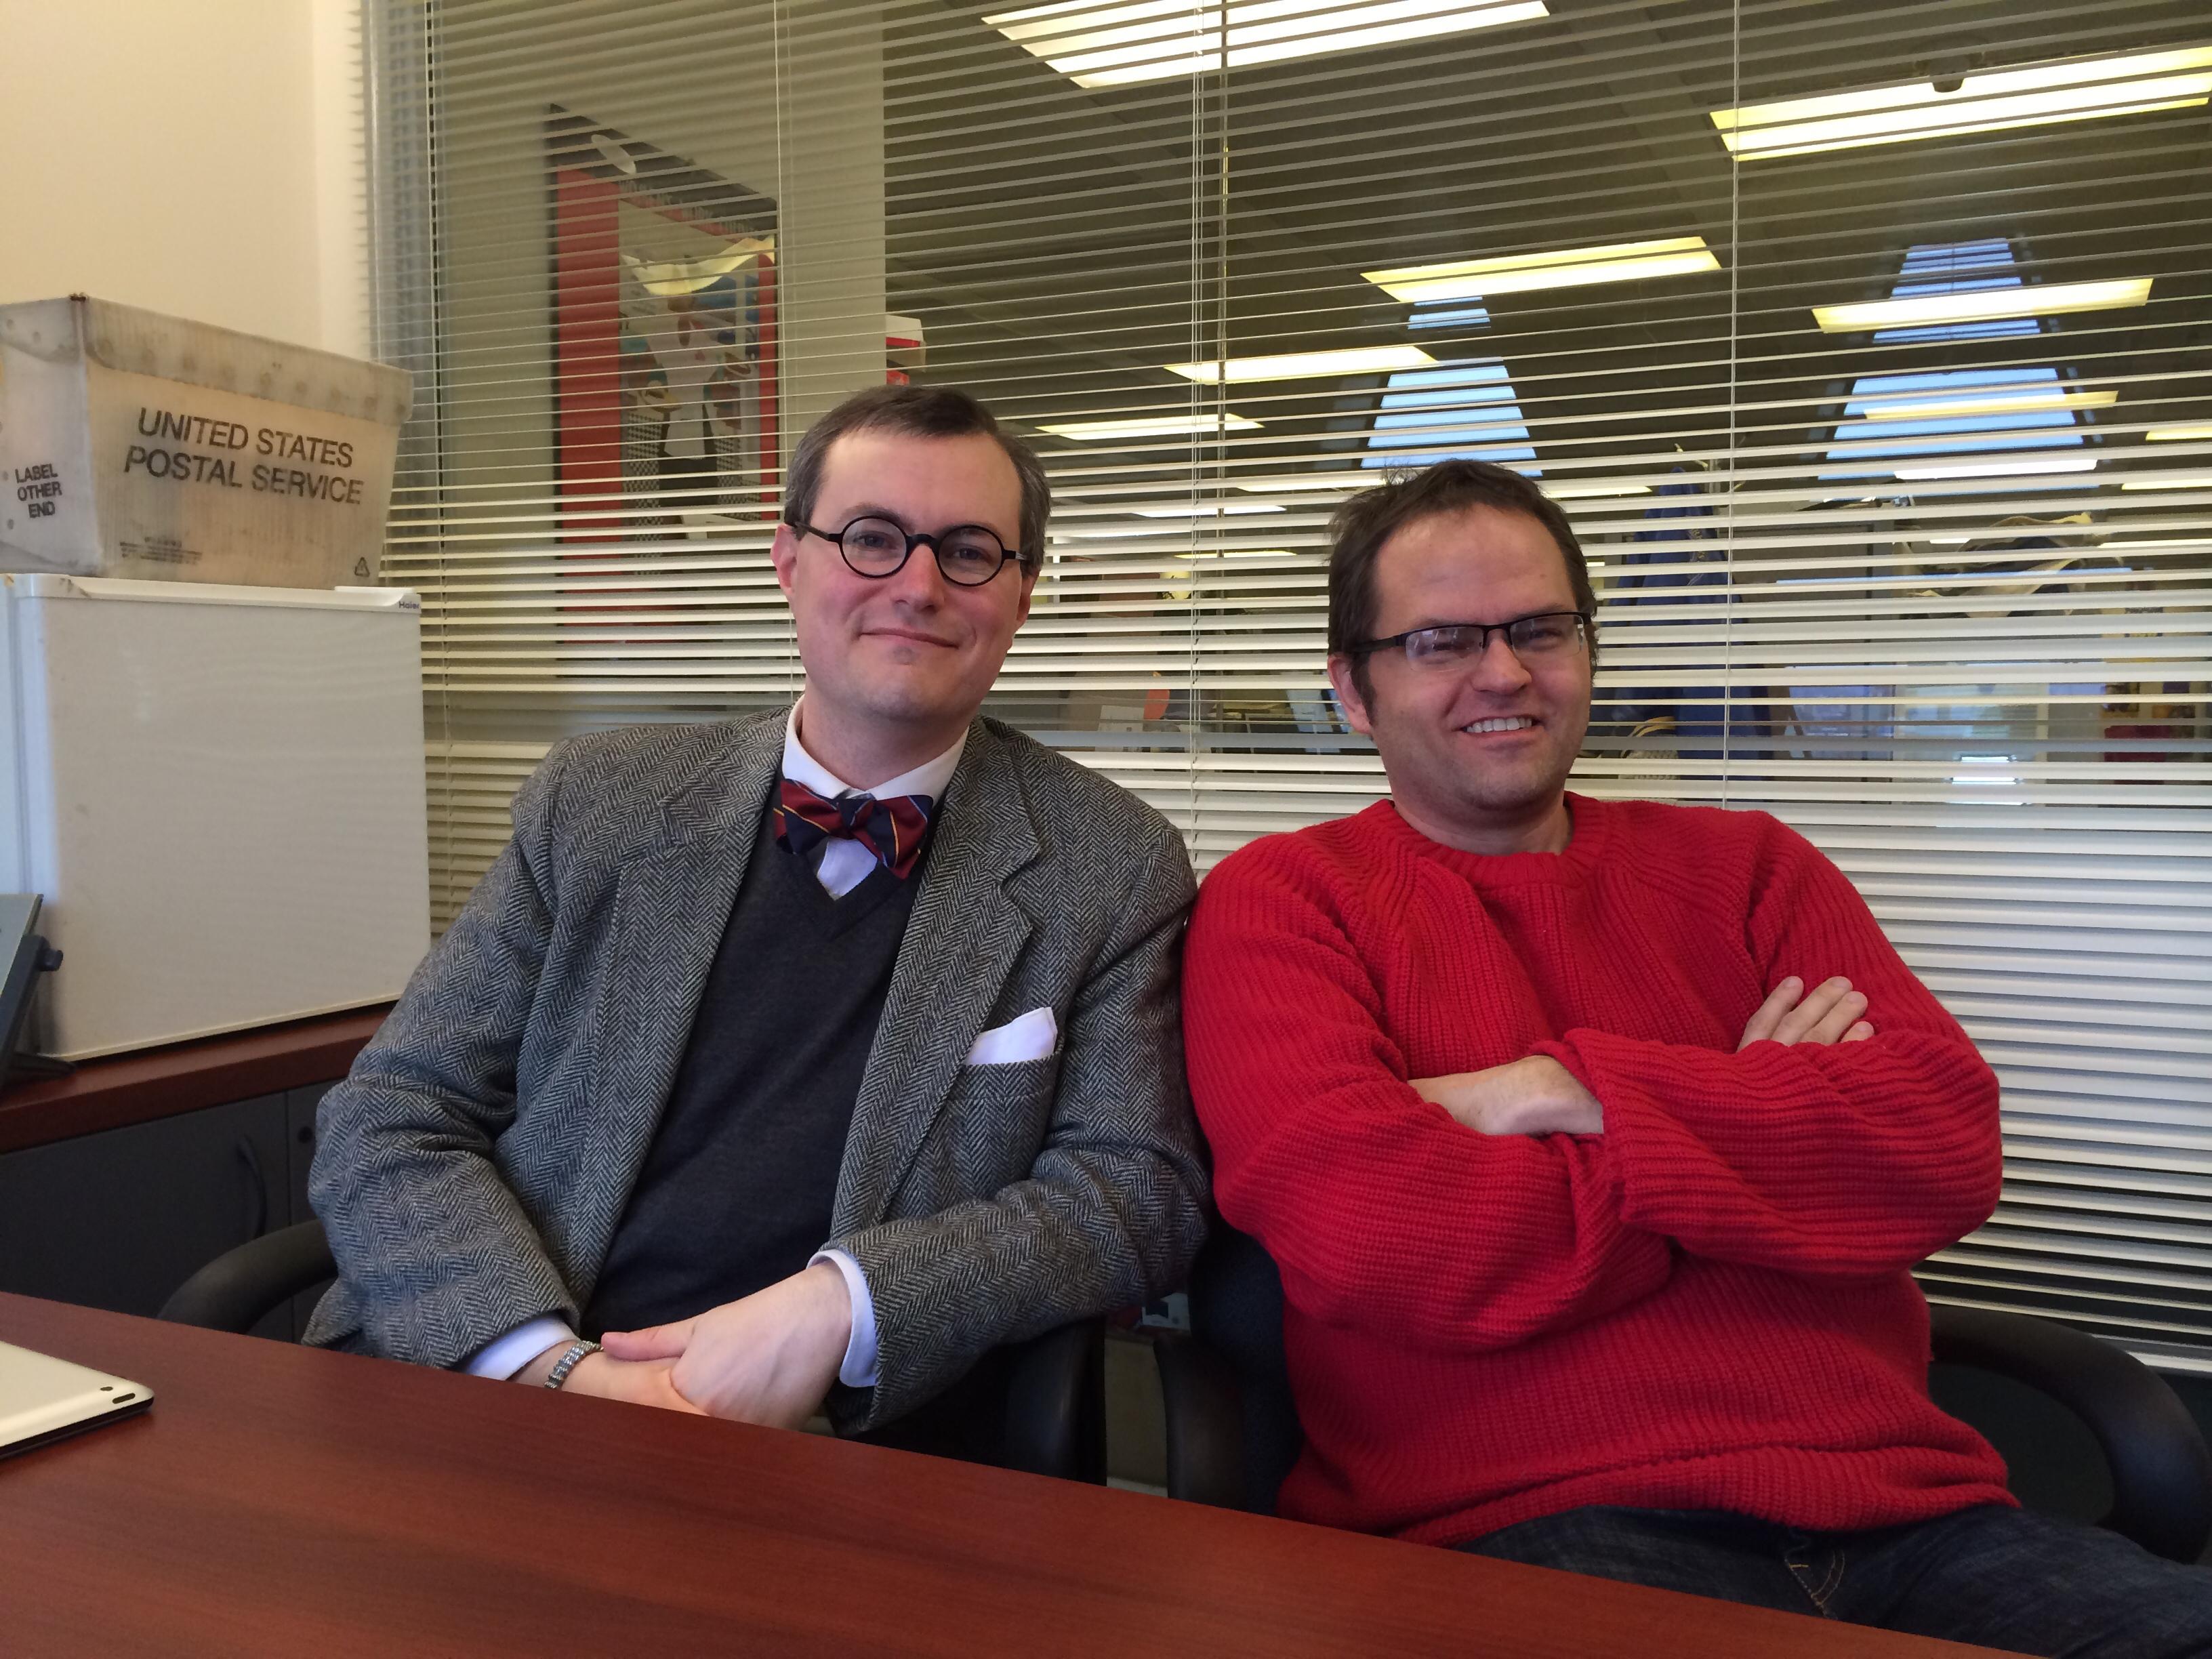 In Pittsburgh's New Economy, Organized Labor Reorganizes | 90.5 WESA